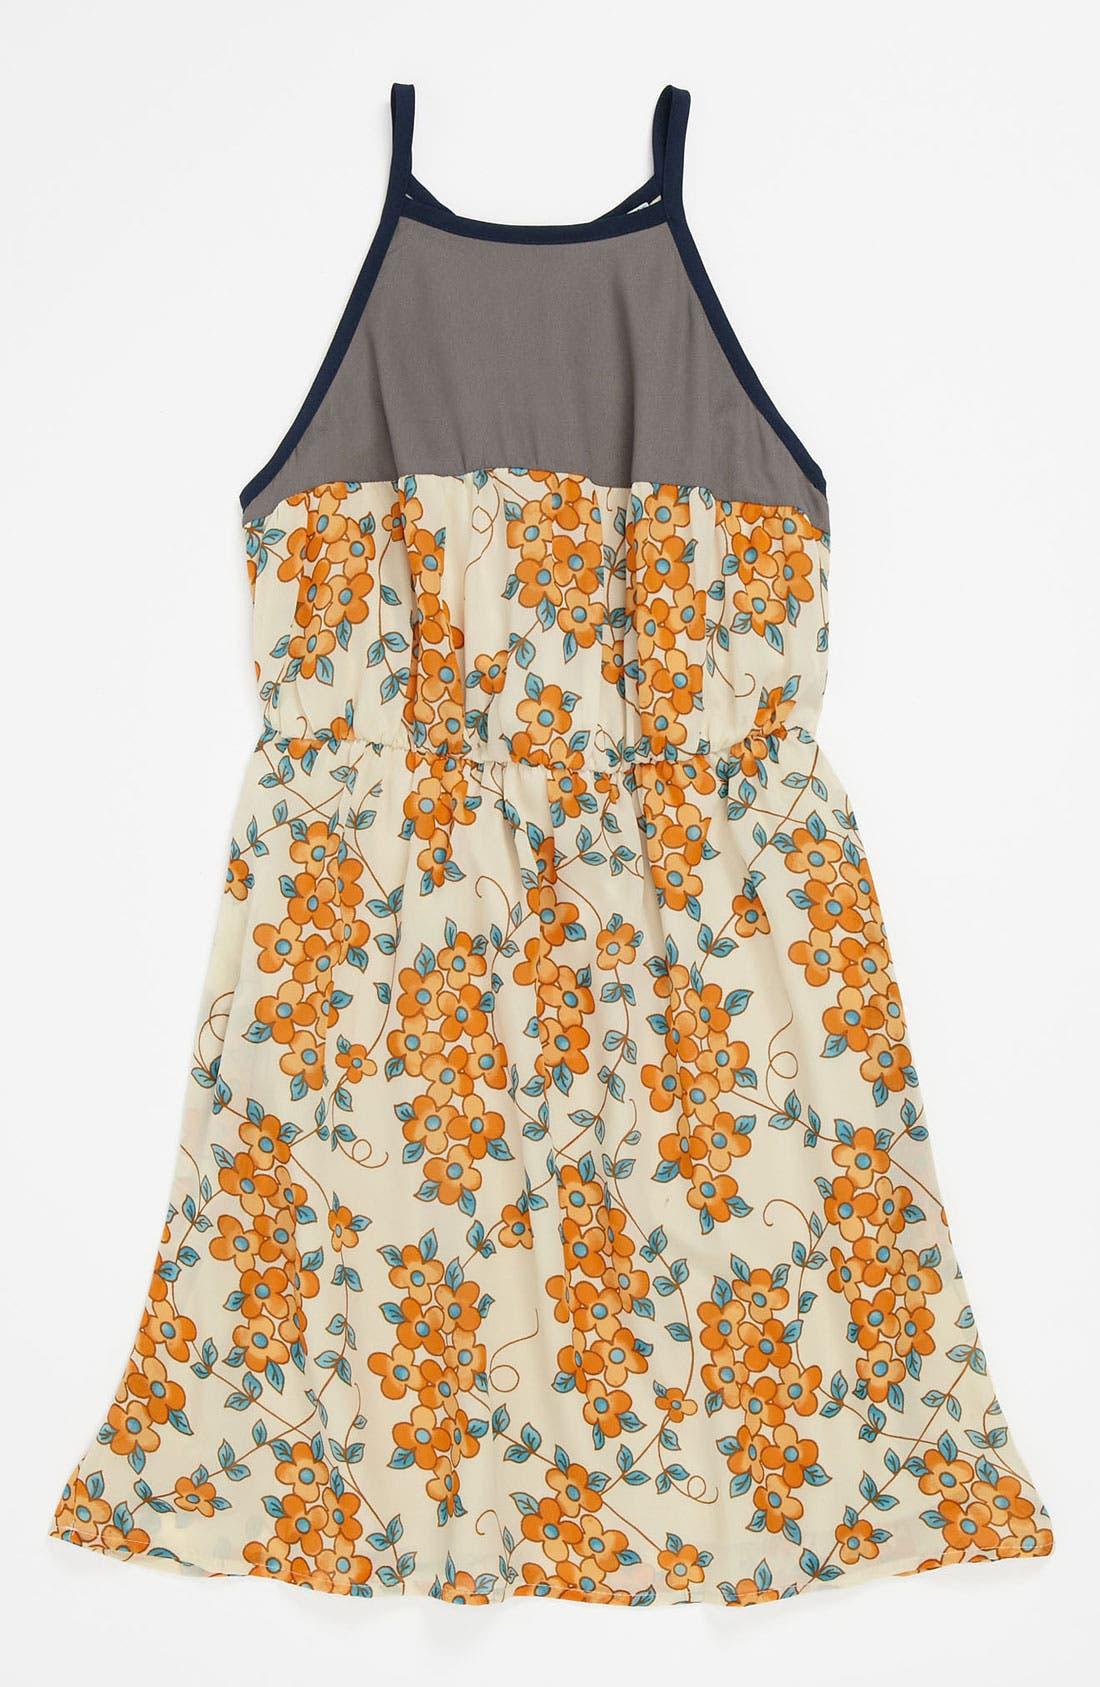 Main Image - Mia Chica Print Dress (Little Girls & Big Girls)